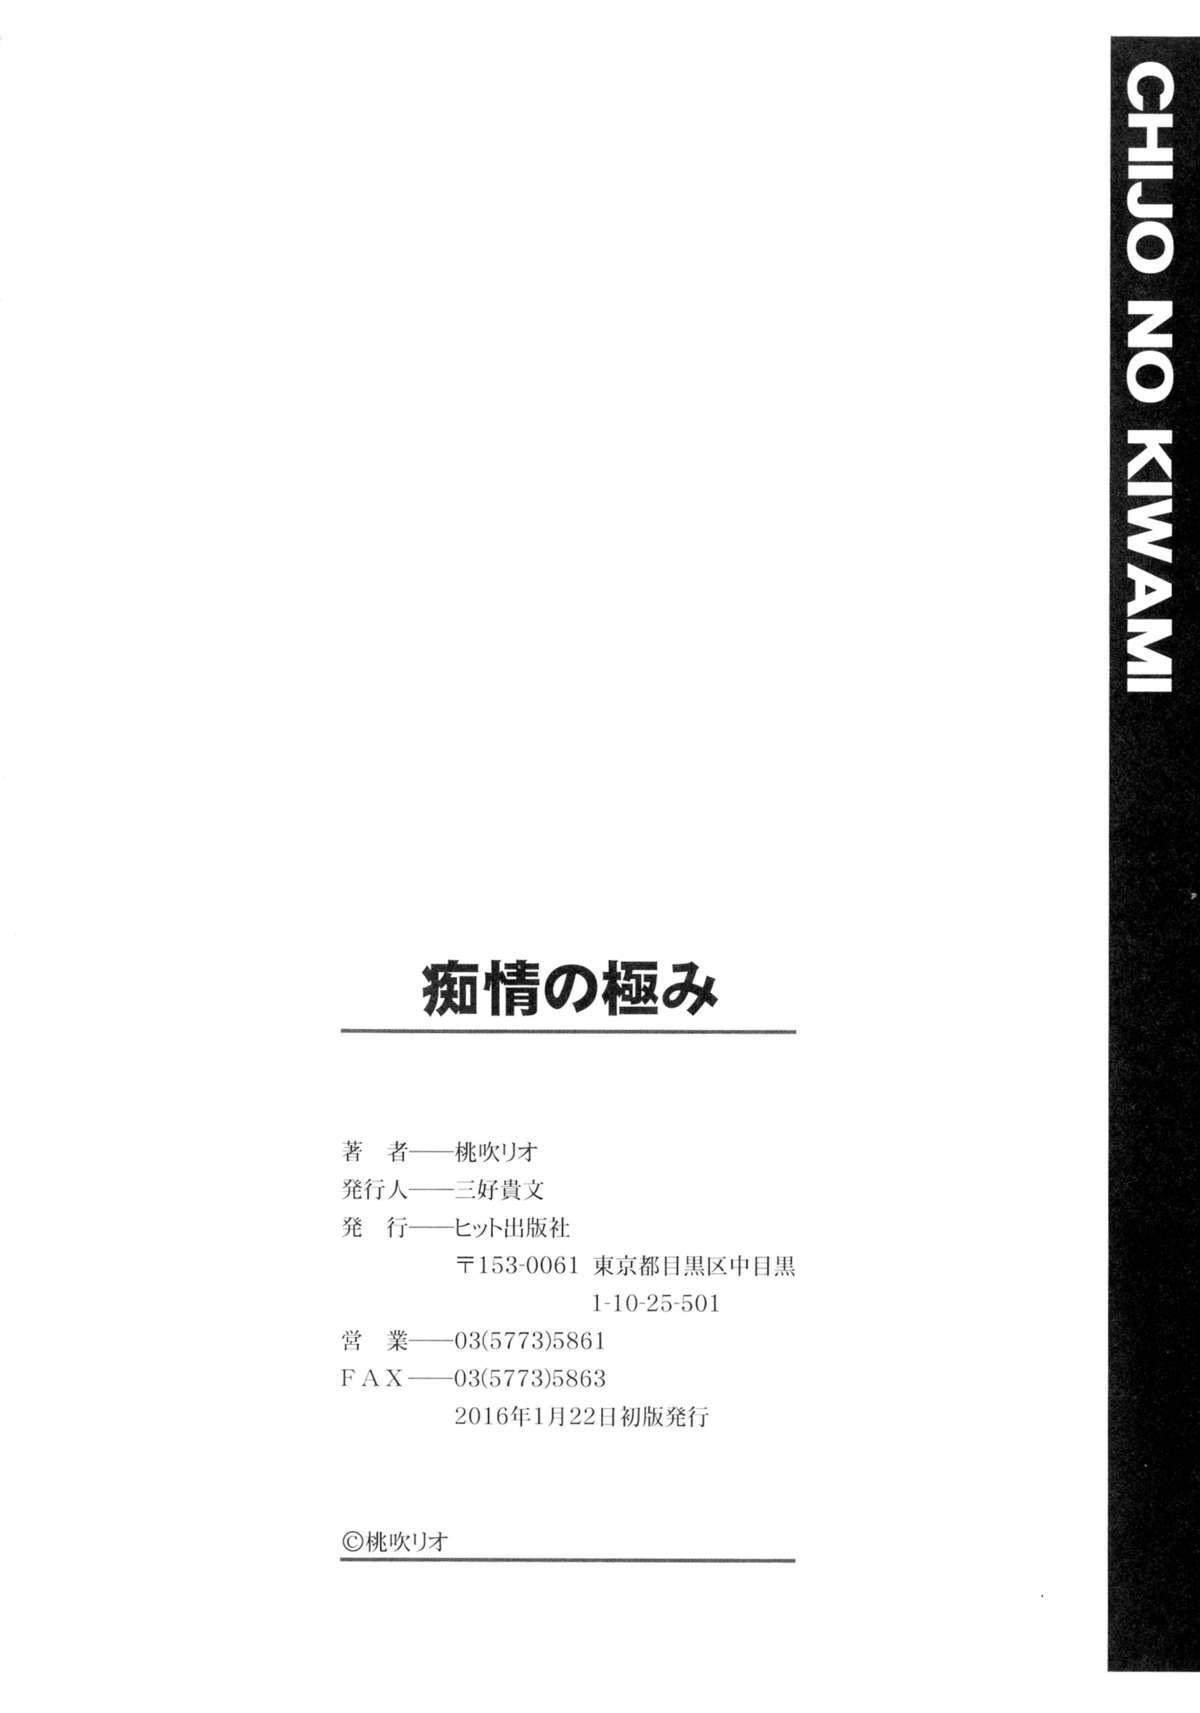 Chijou no Kiwami - Extremity of the blind love 195